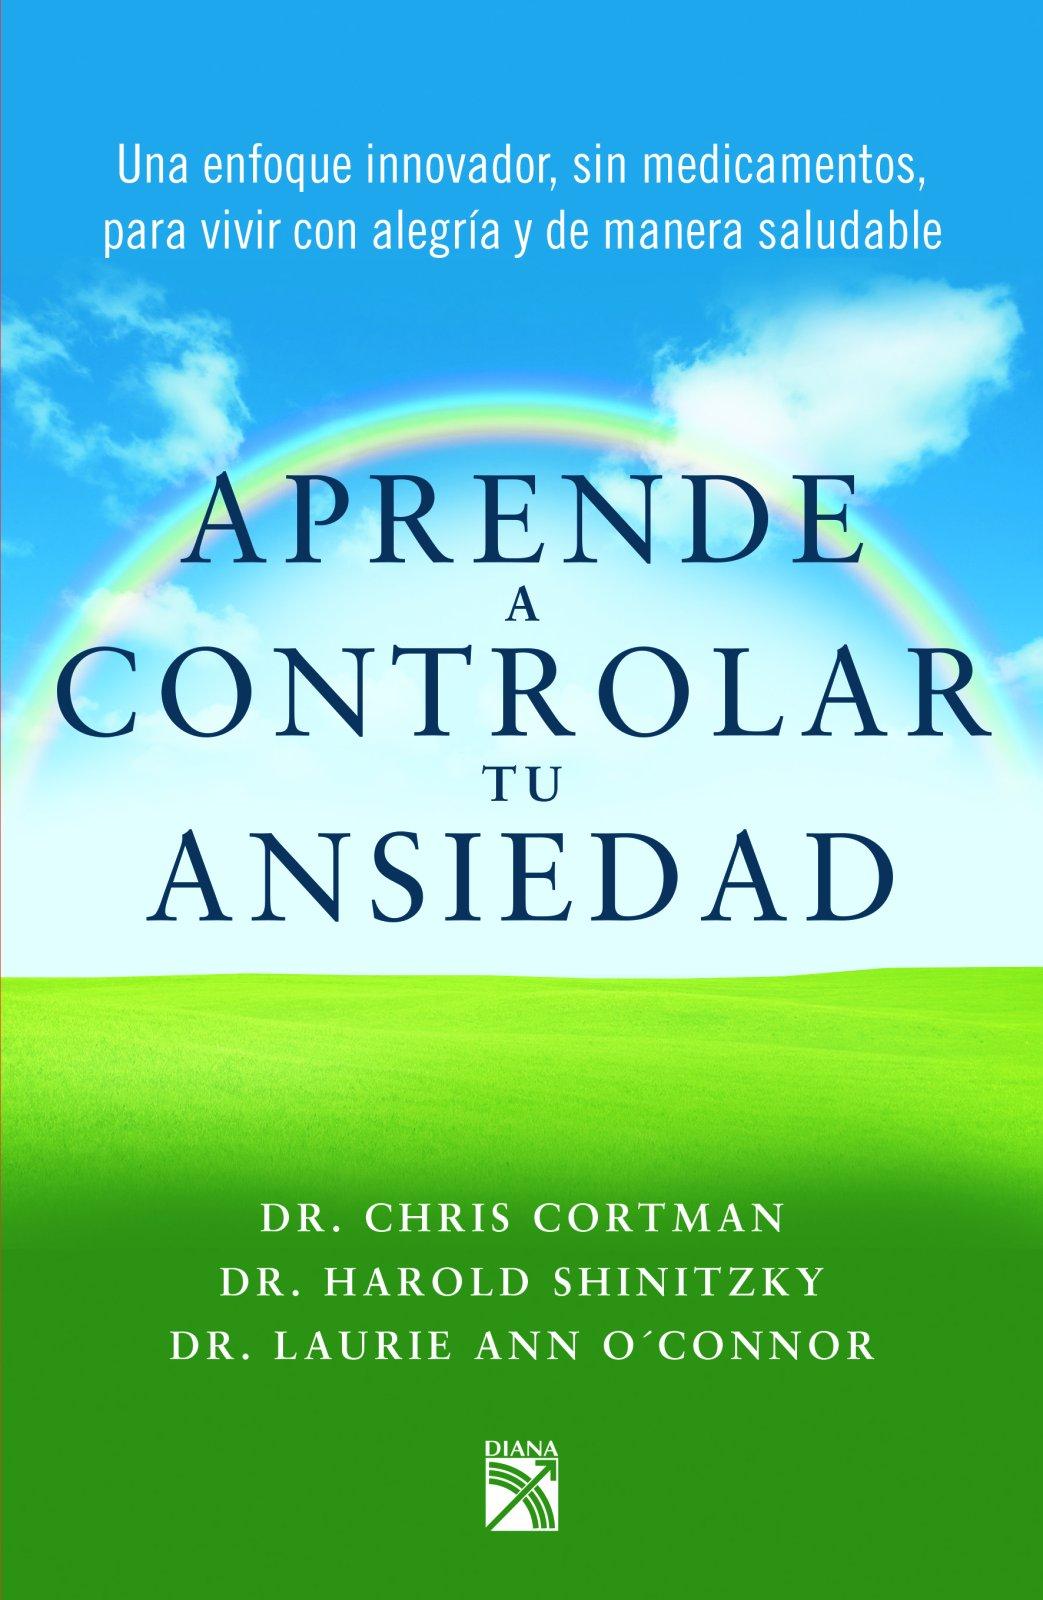 Aprende a controlar tu ansiedad (Spanish Edition): Christ Cortman, Harold  Shinitzky: 9786070738142: Amazon.com: Books